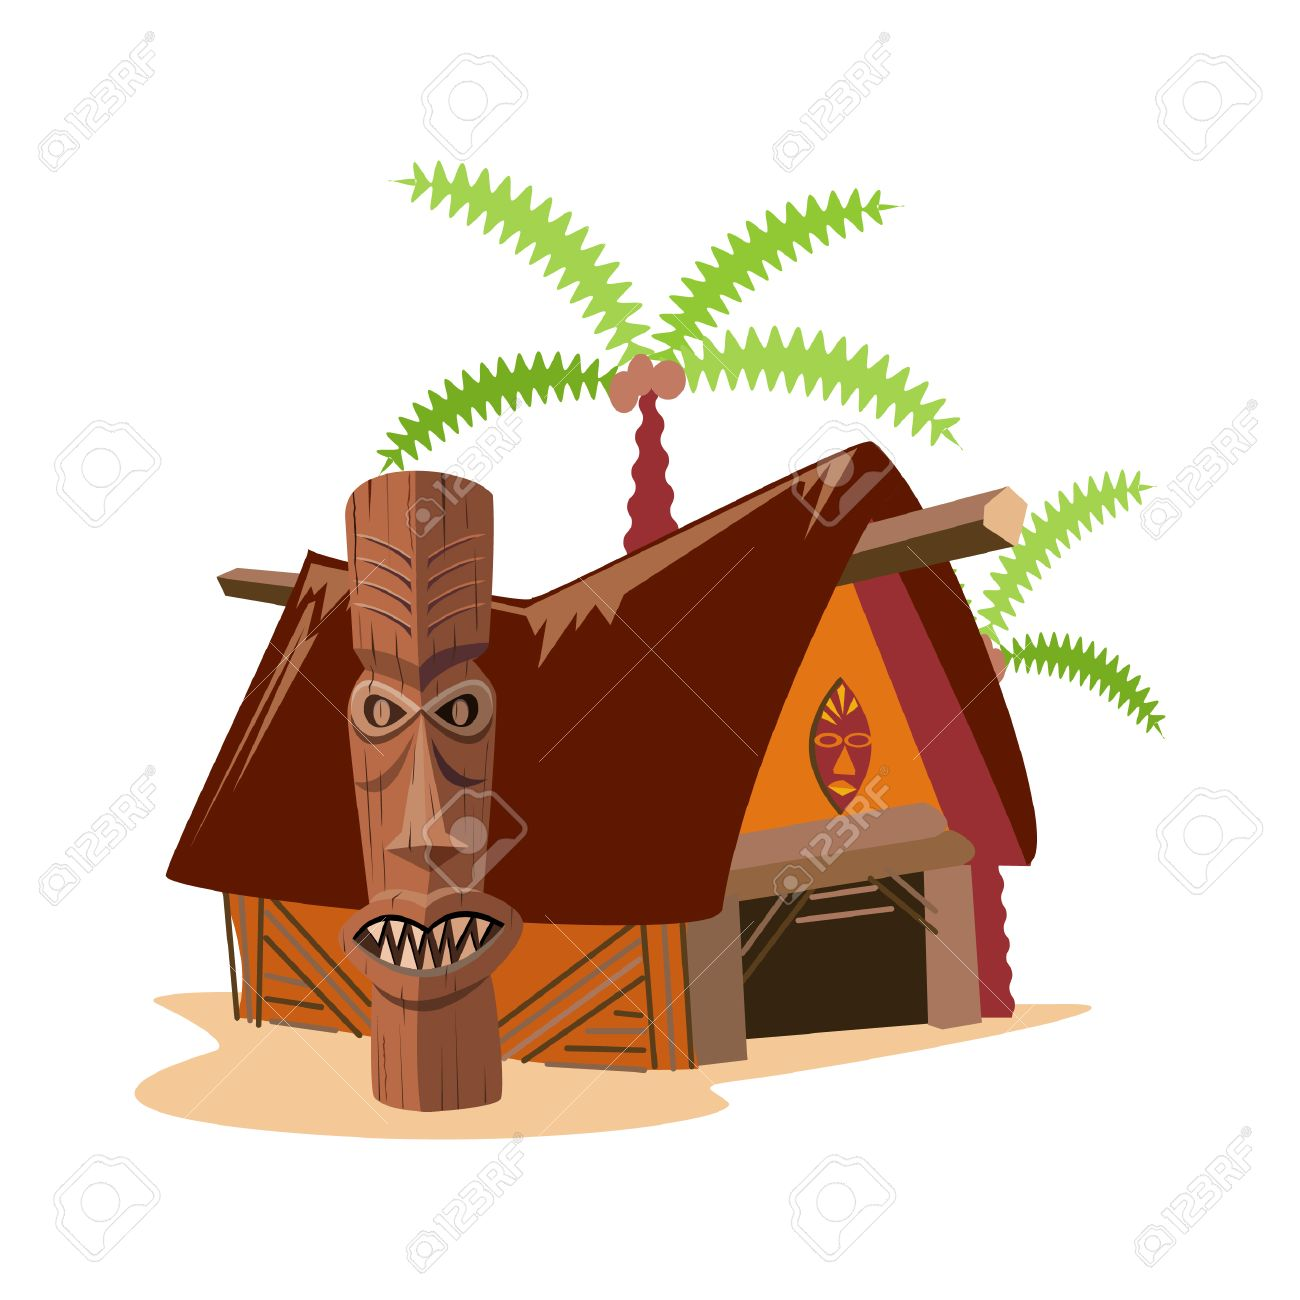 tiki hut royalty free cliparts vectors and stock illustration rh 123rf com tiki hut clip art free tiki hut clipart free